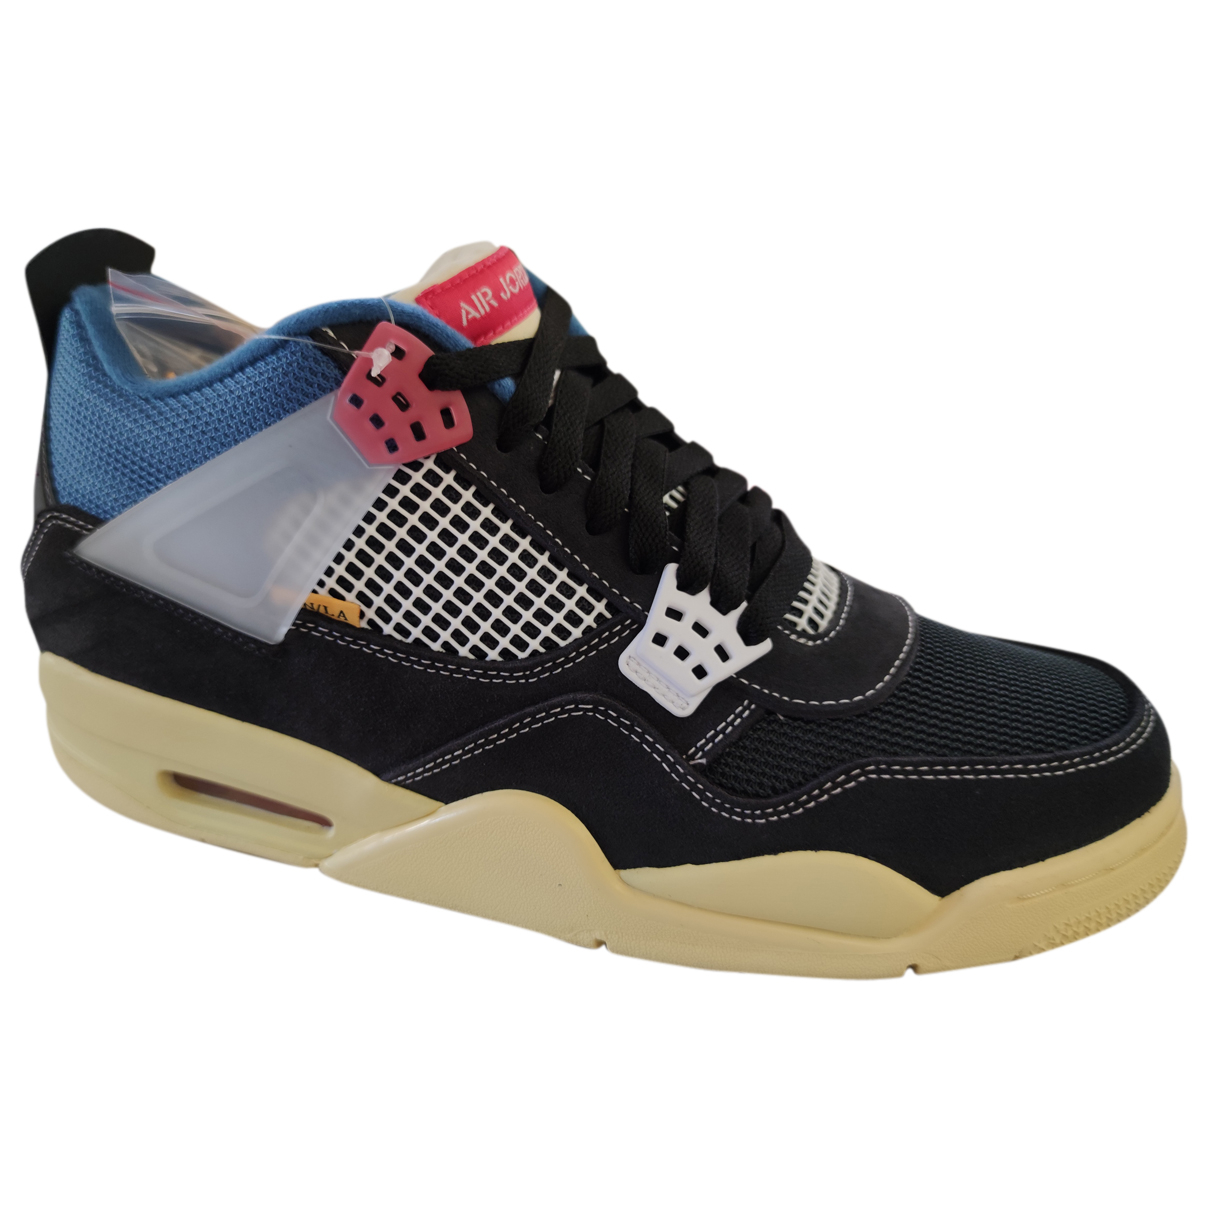 Jordan Air Jordan 4 Sneakers in  Anthrazit Veloursleder